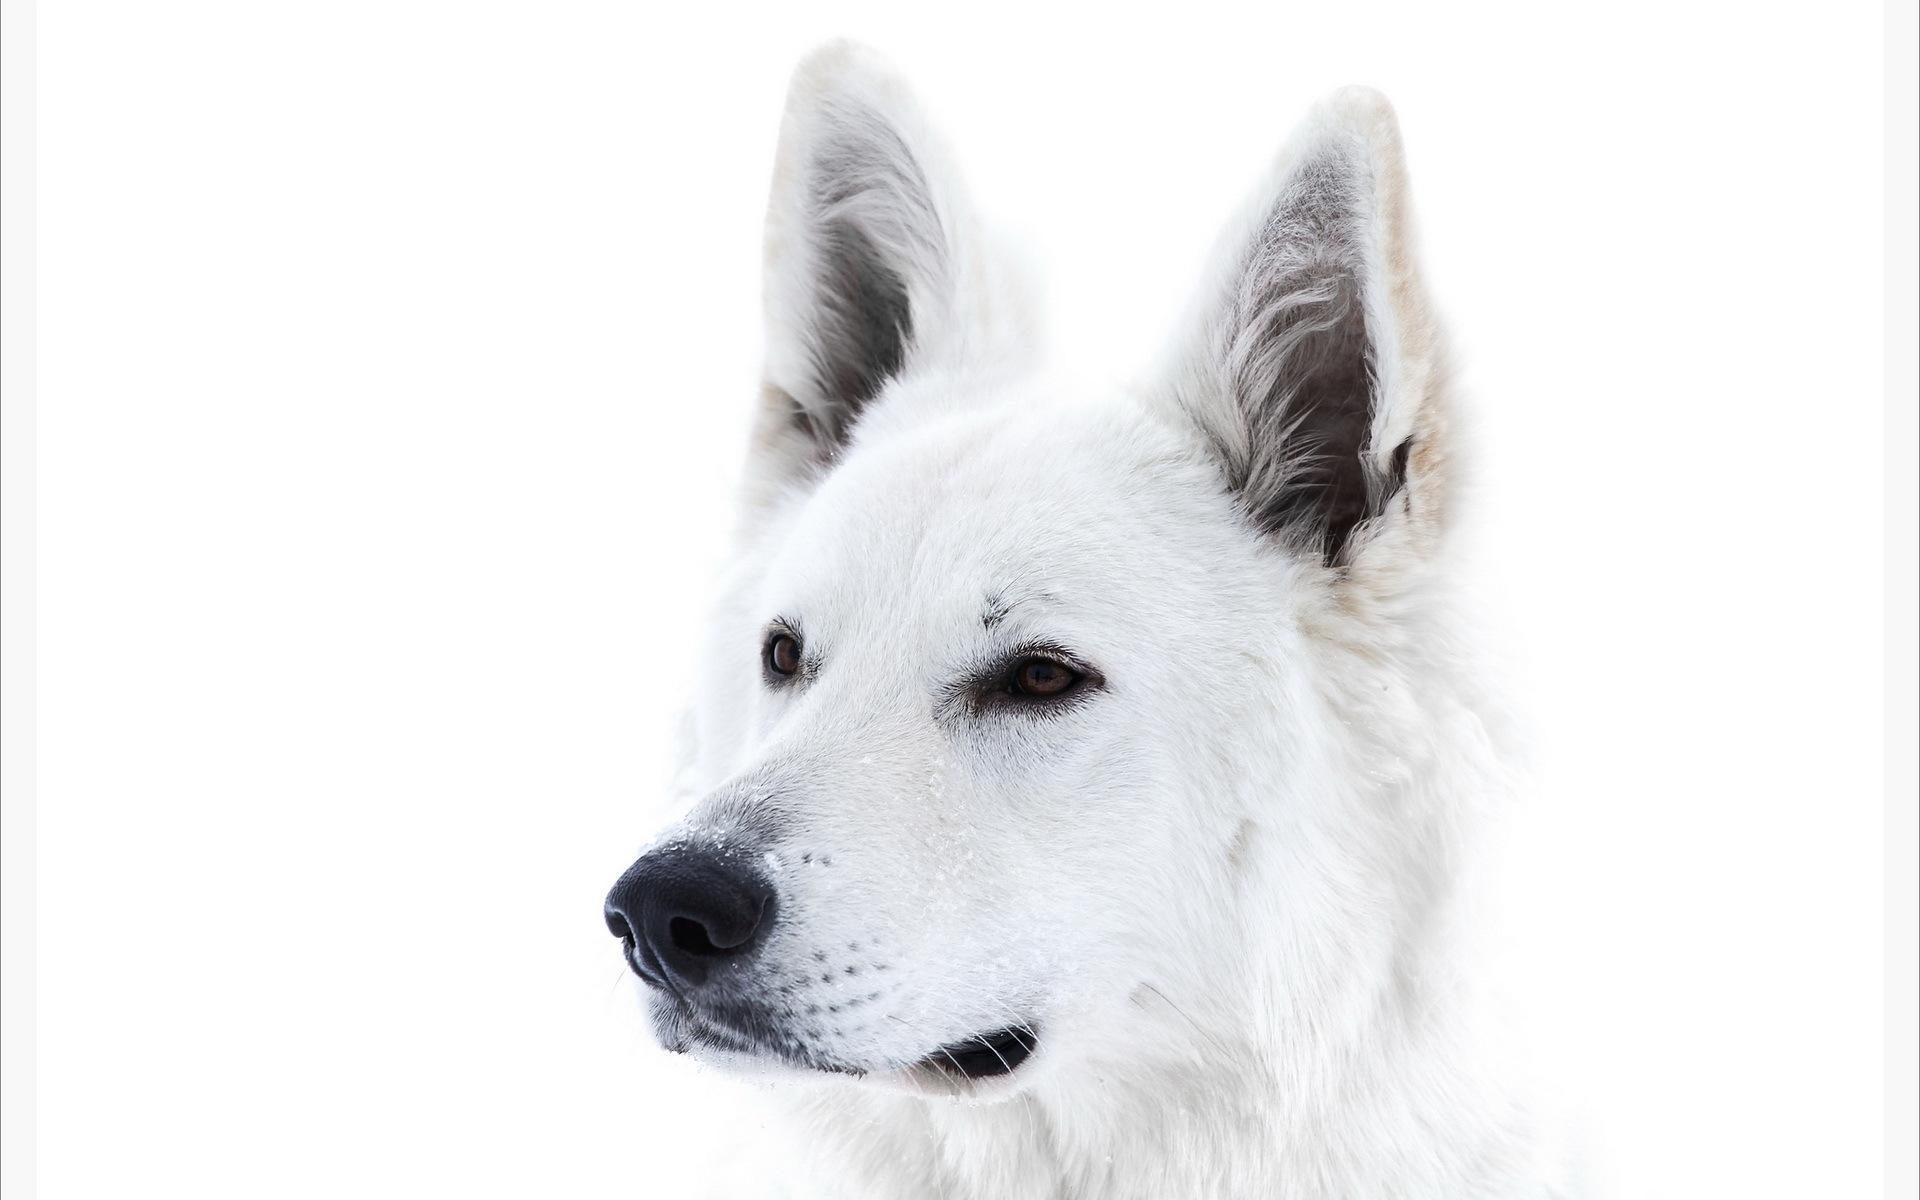 White Dog Snow Wallpaper Picture